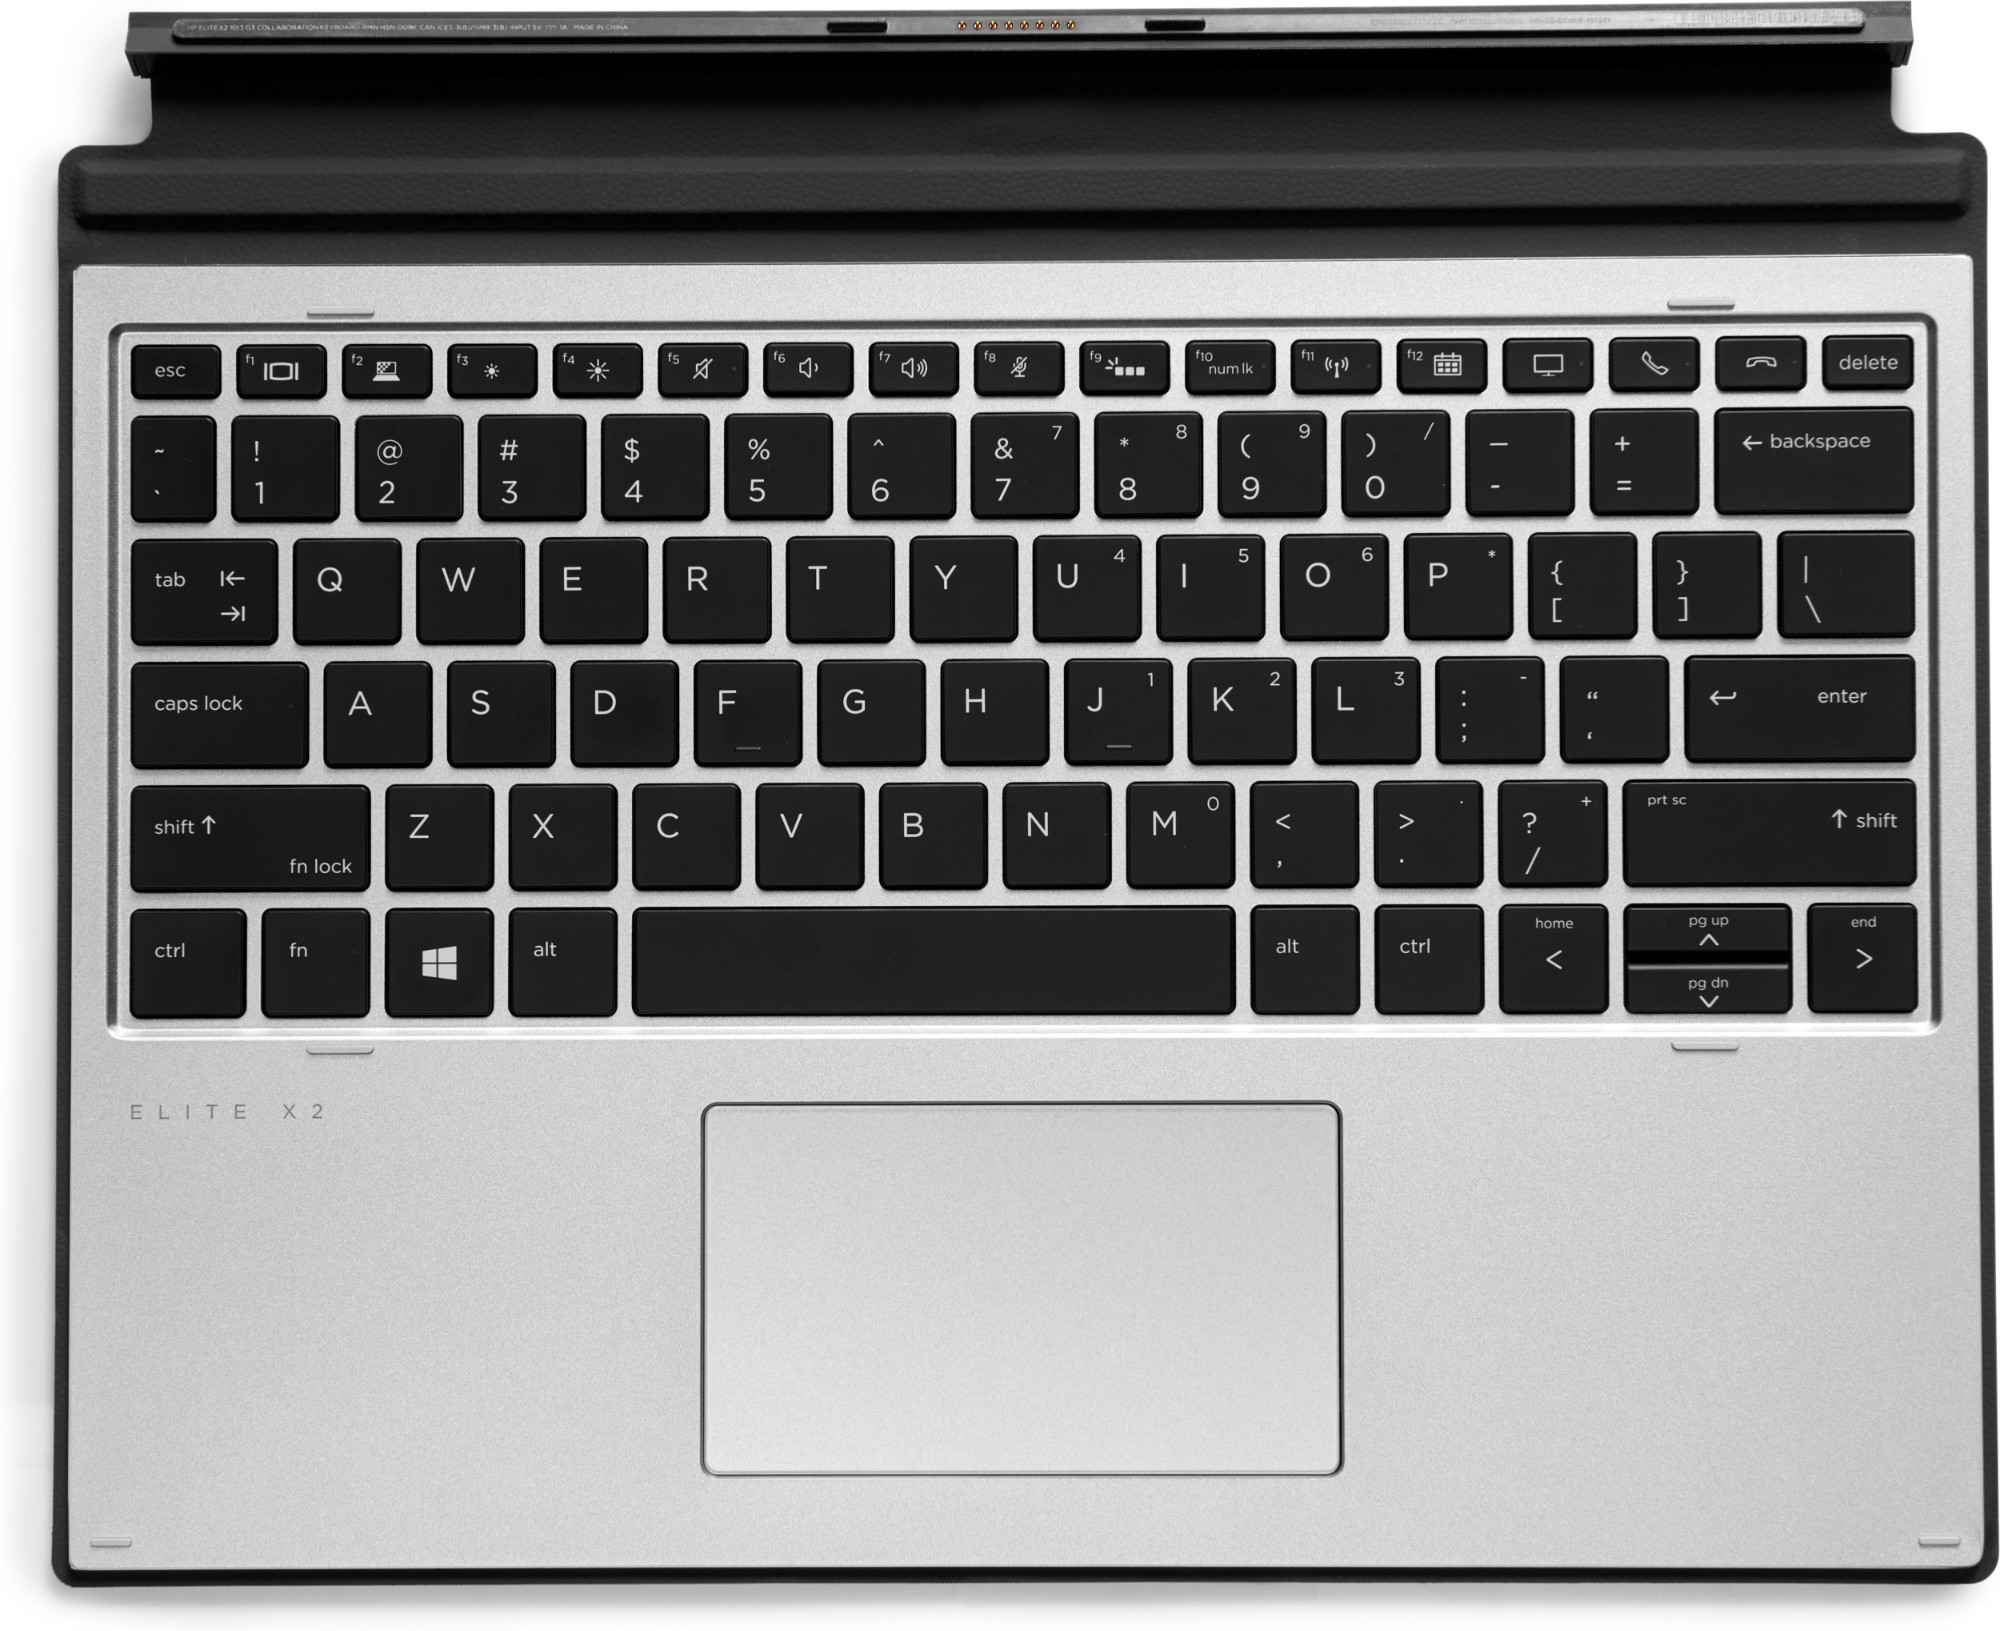 HP Elite x2 G4 Collaboration keyboard